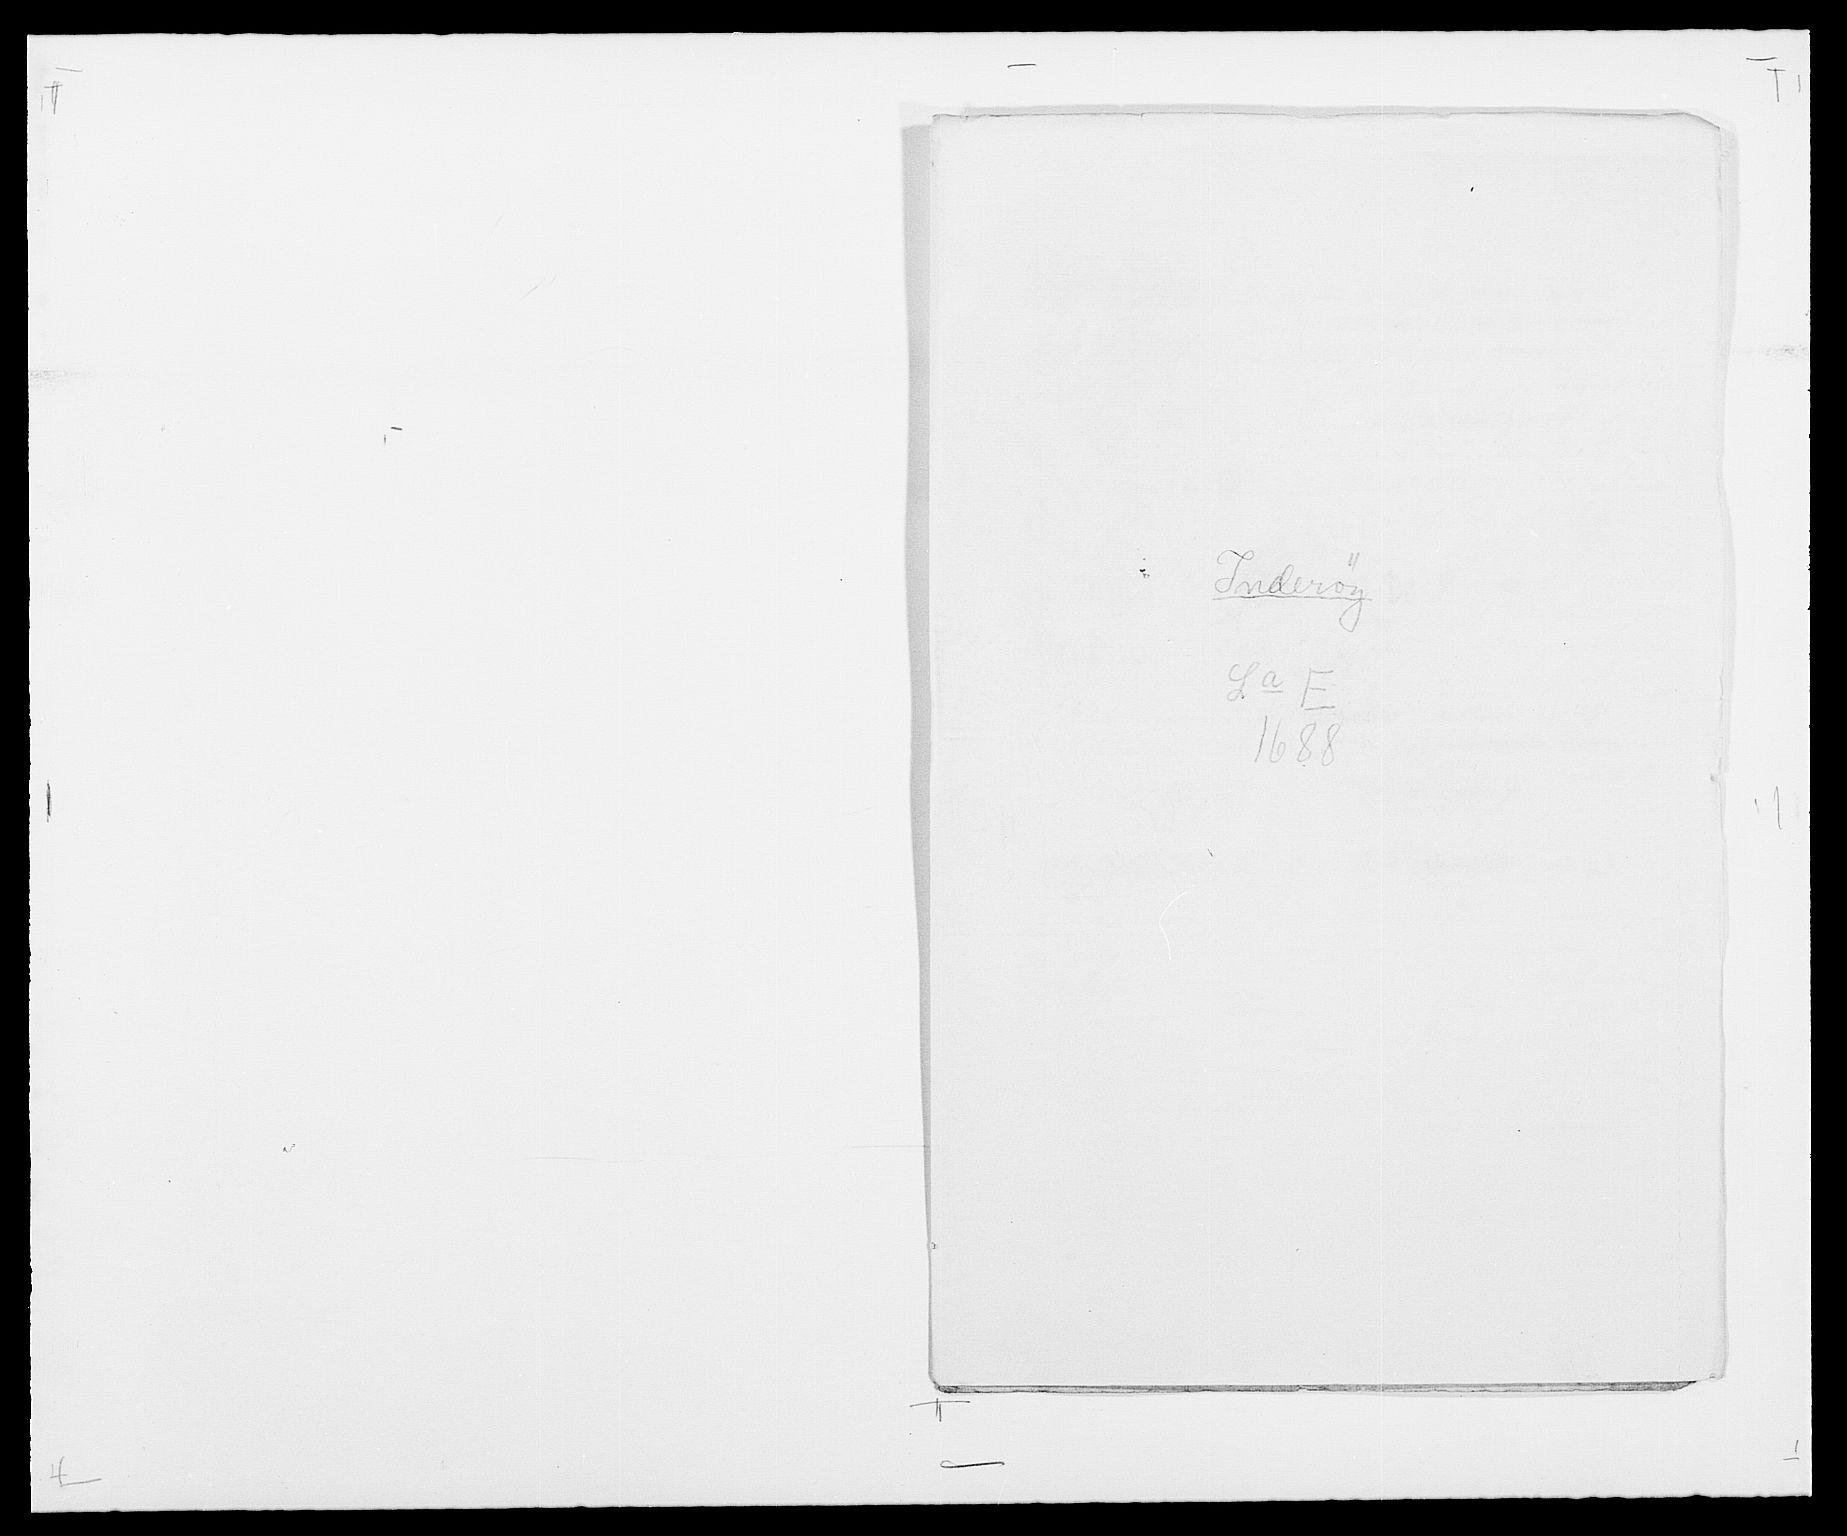 RA, Rentekammeret inntil 1814, Reviderte regnskaper, Fogderegnskap, R63/L4306: Fogderegnskap Inderøy, 1687-1689, s. 264